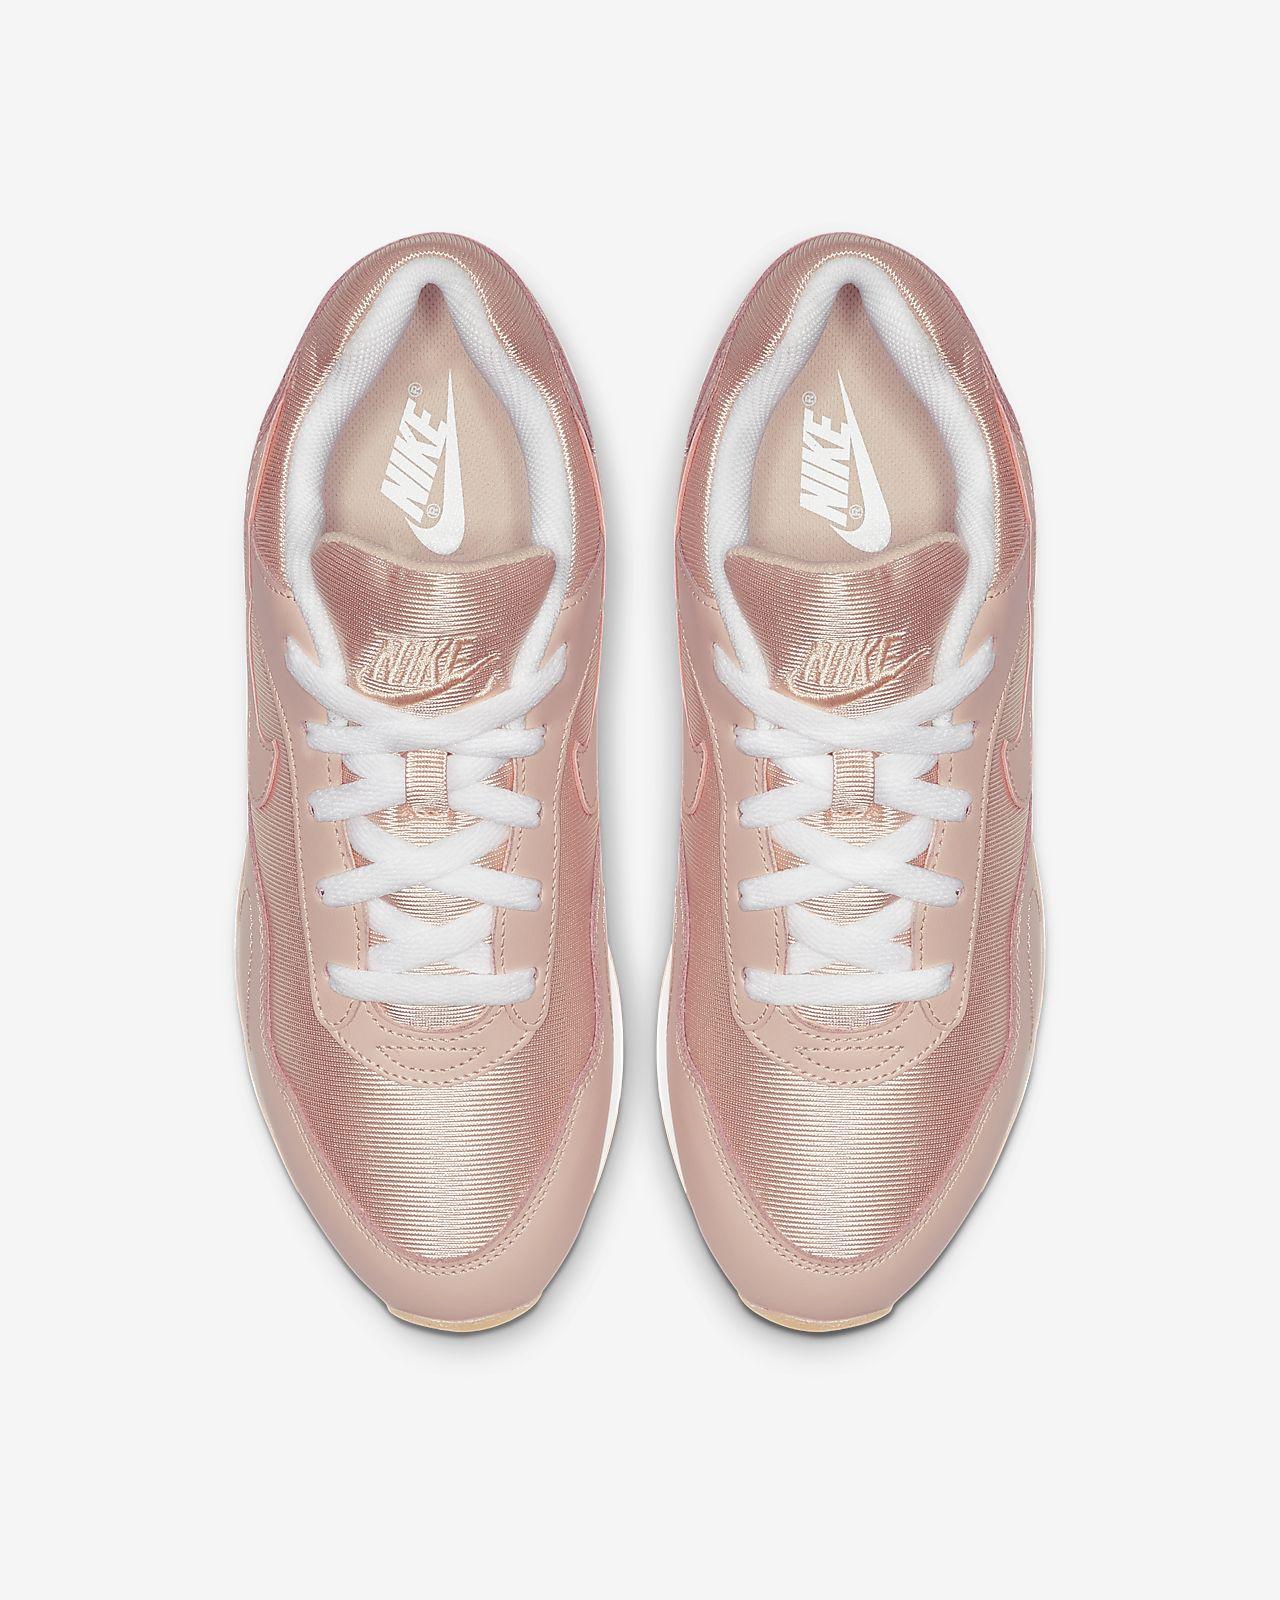 pretty nice 943db 48387 Low Resolution Nike Outburst Women s Shoe Nike Outburst Women s Shoe